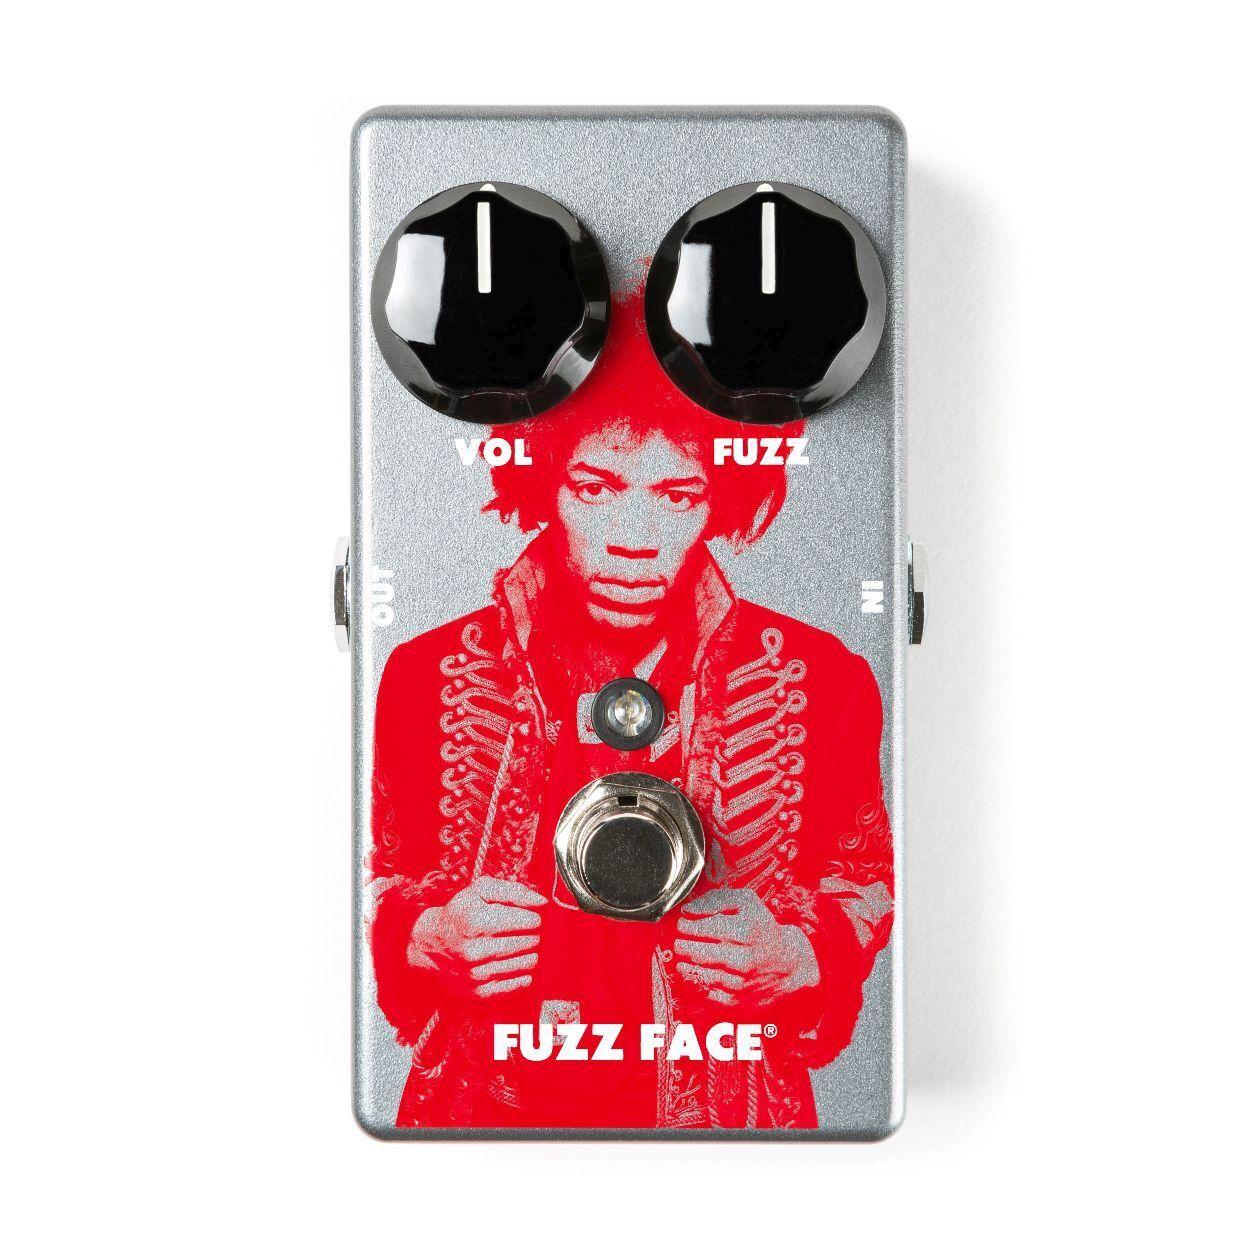 Dunlop Jimi Hendrix Fuzz Face buono di-Distortion Limited Edition